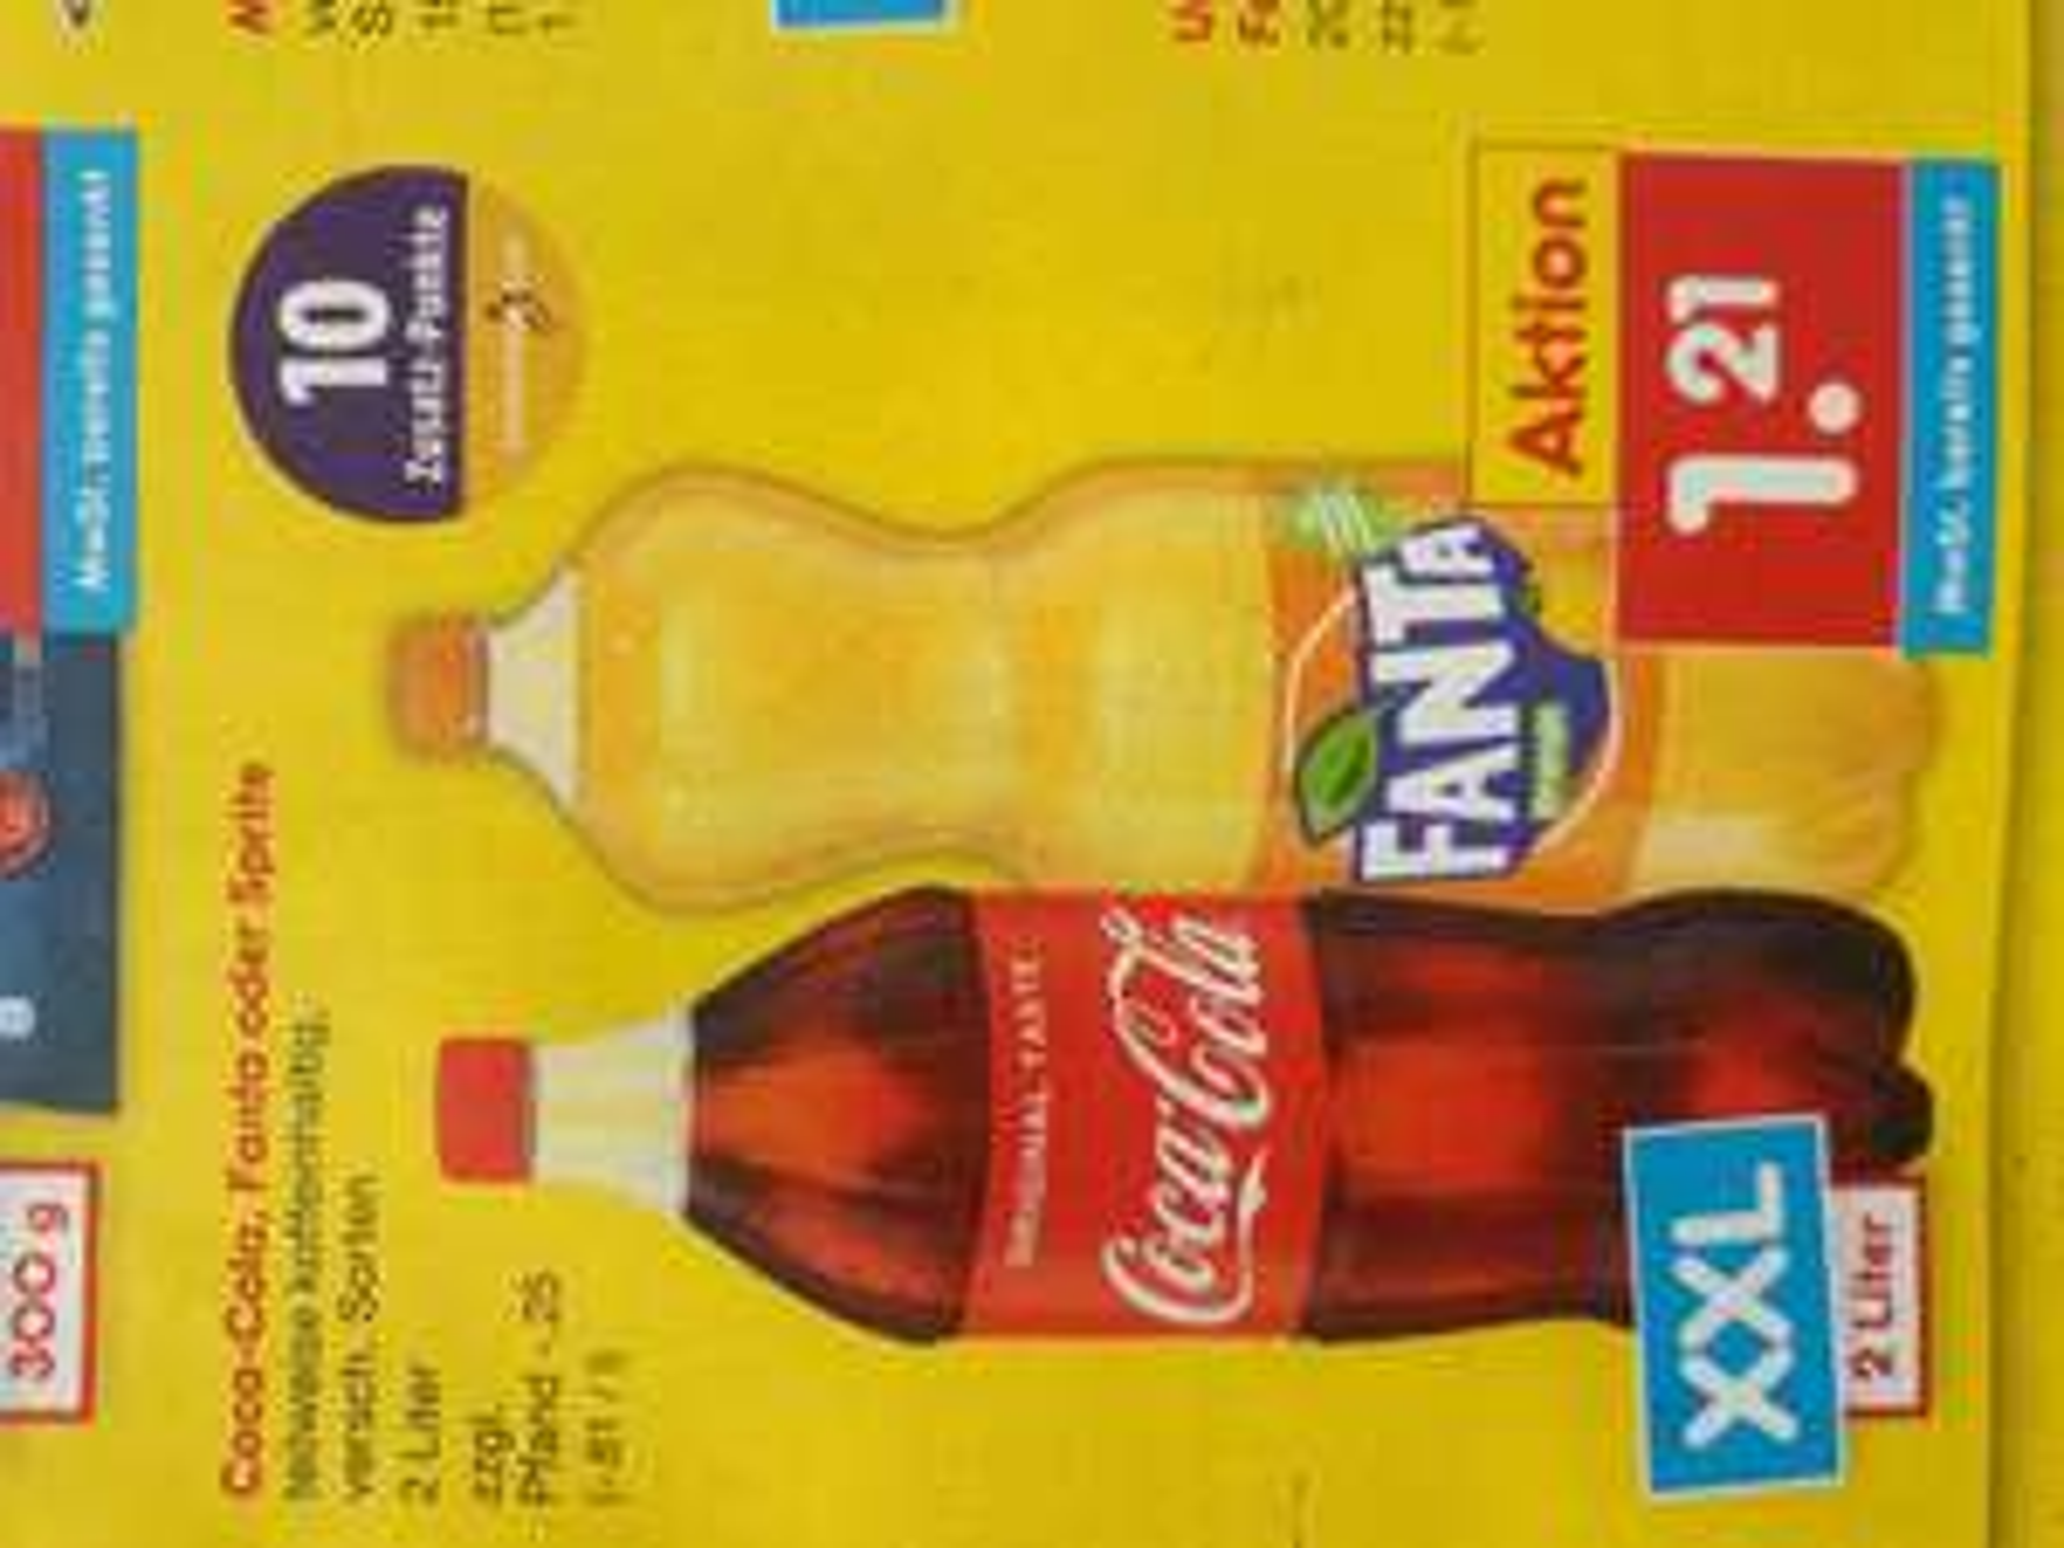 Coca-cola 2 Liter 1.21 € bei Netto